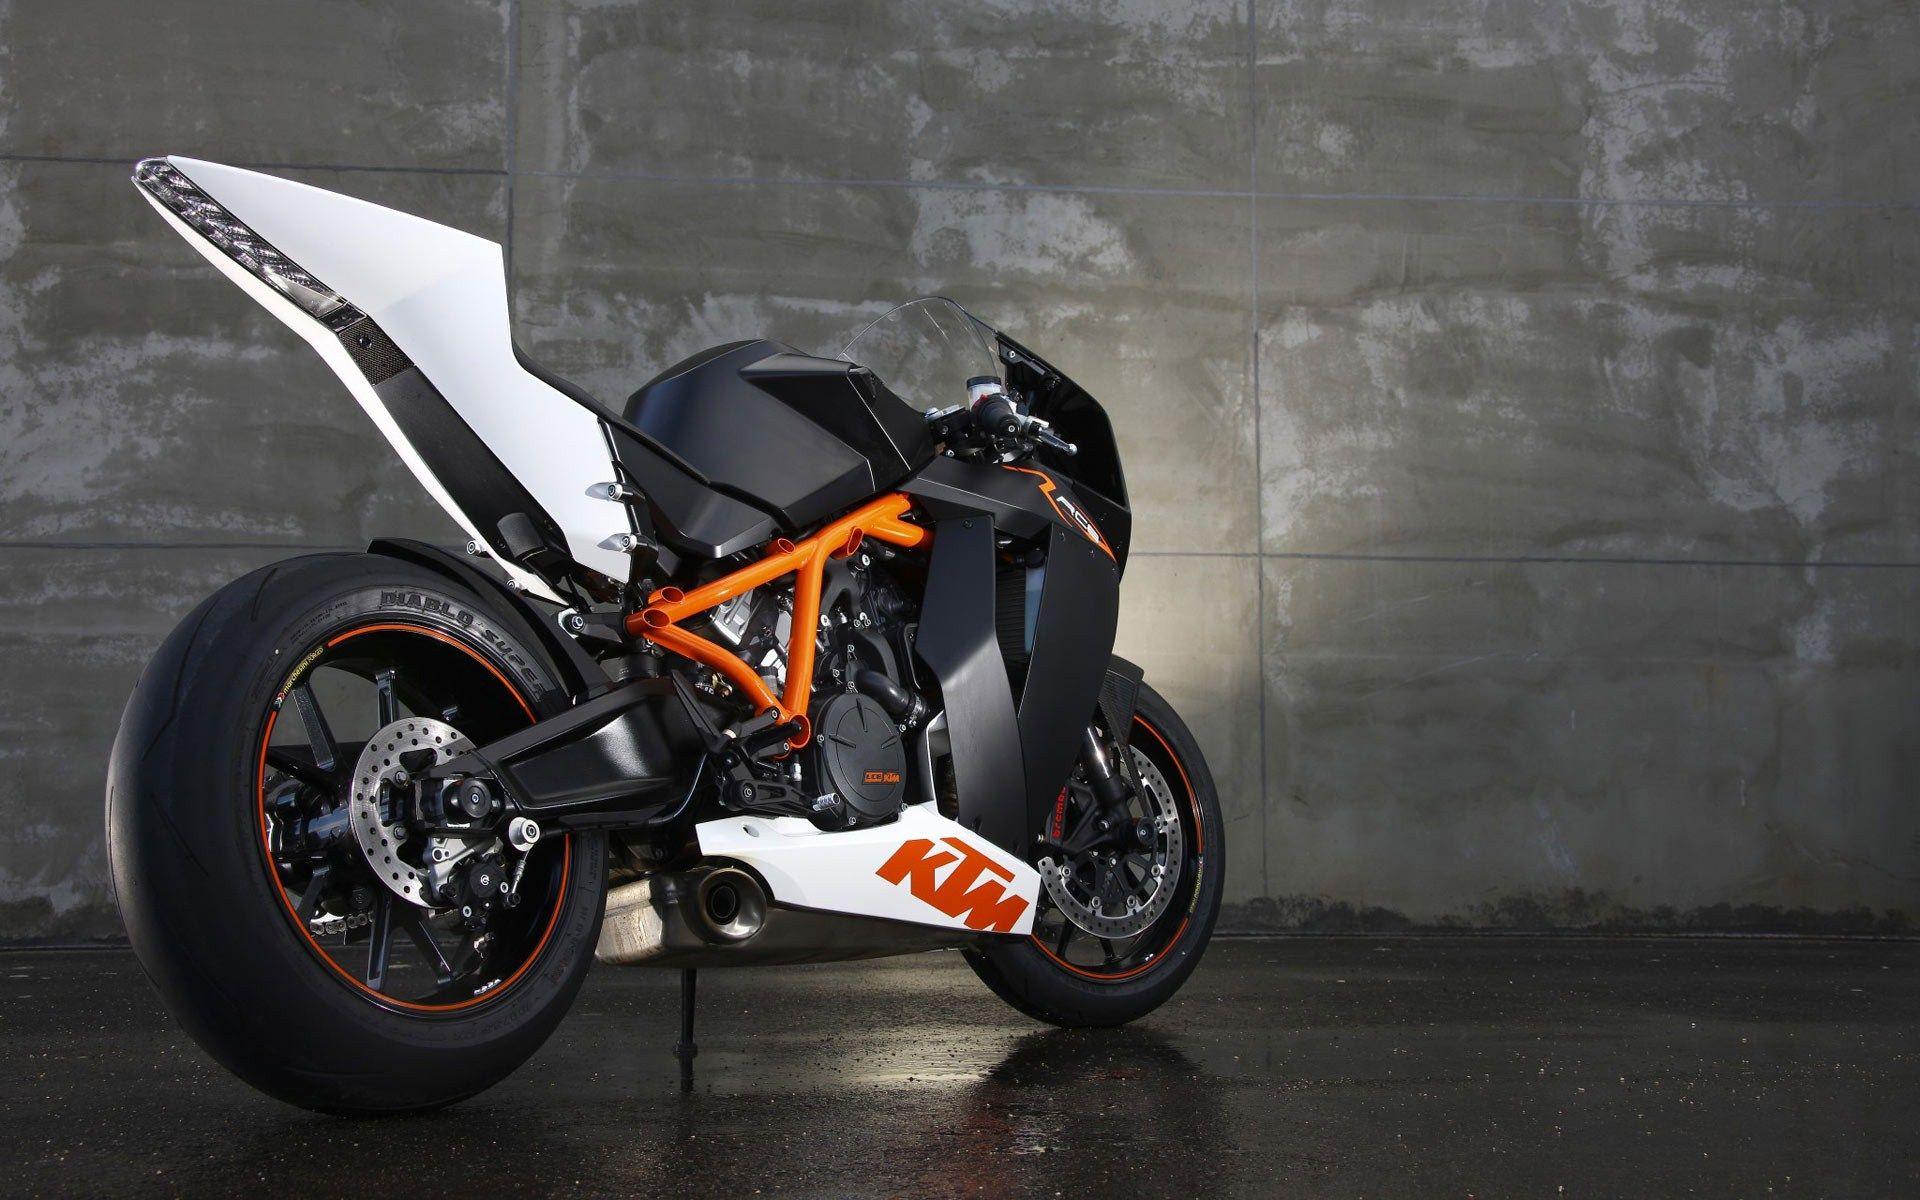 Ktm Sportsbike Superbike Motorcycle Wallpaper